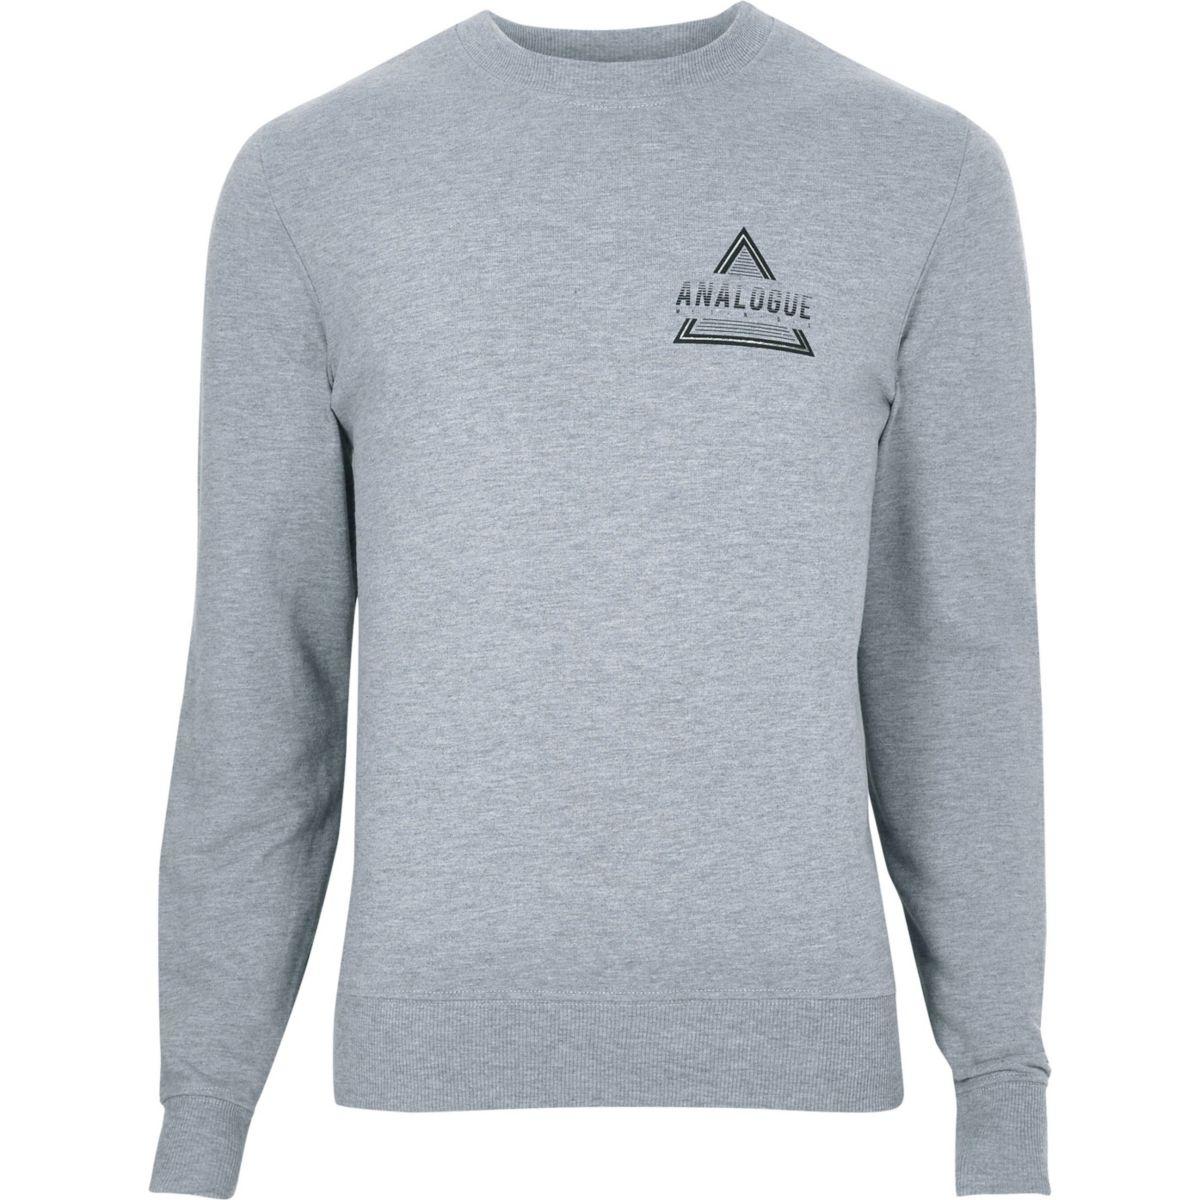 Grey marl 'analogue' print sweatshirt